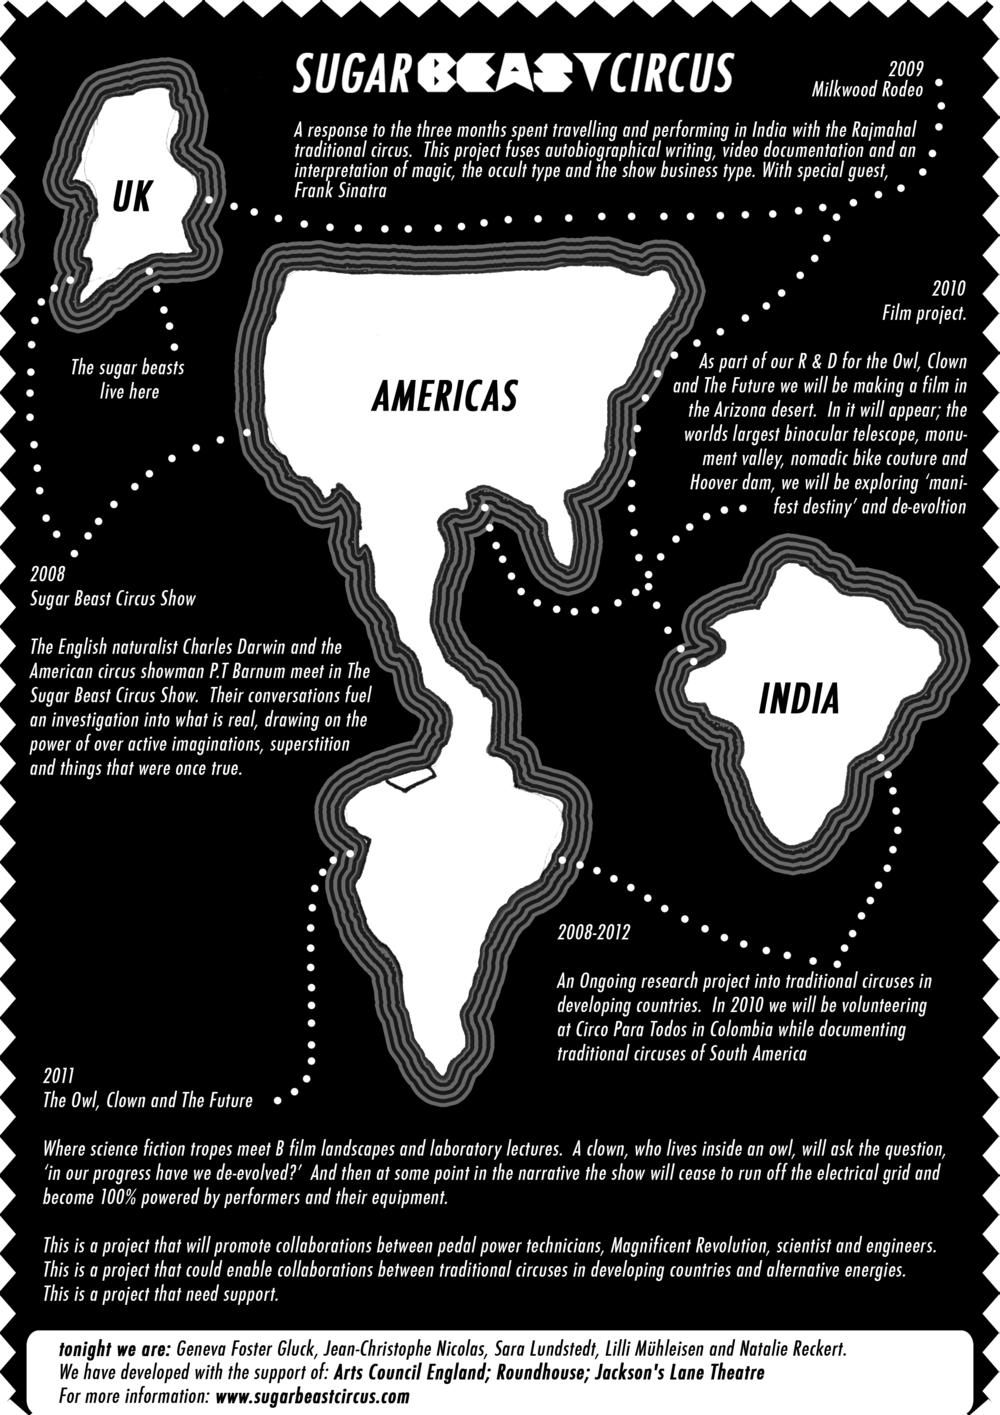 sbcmap.jpg